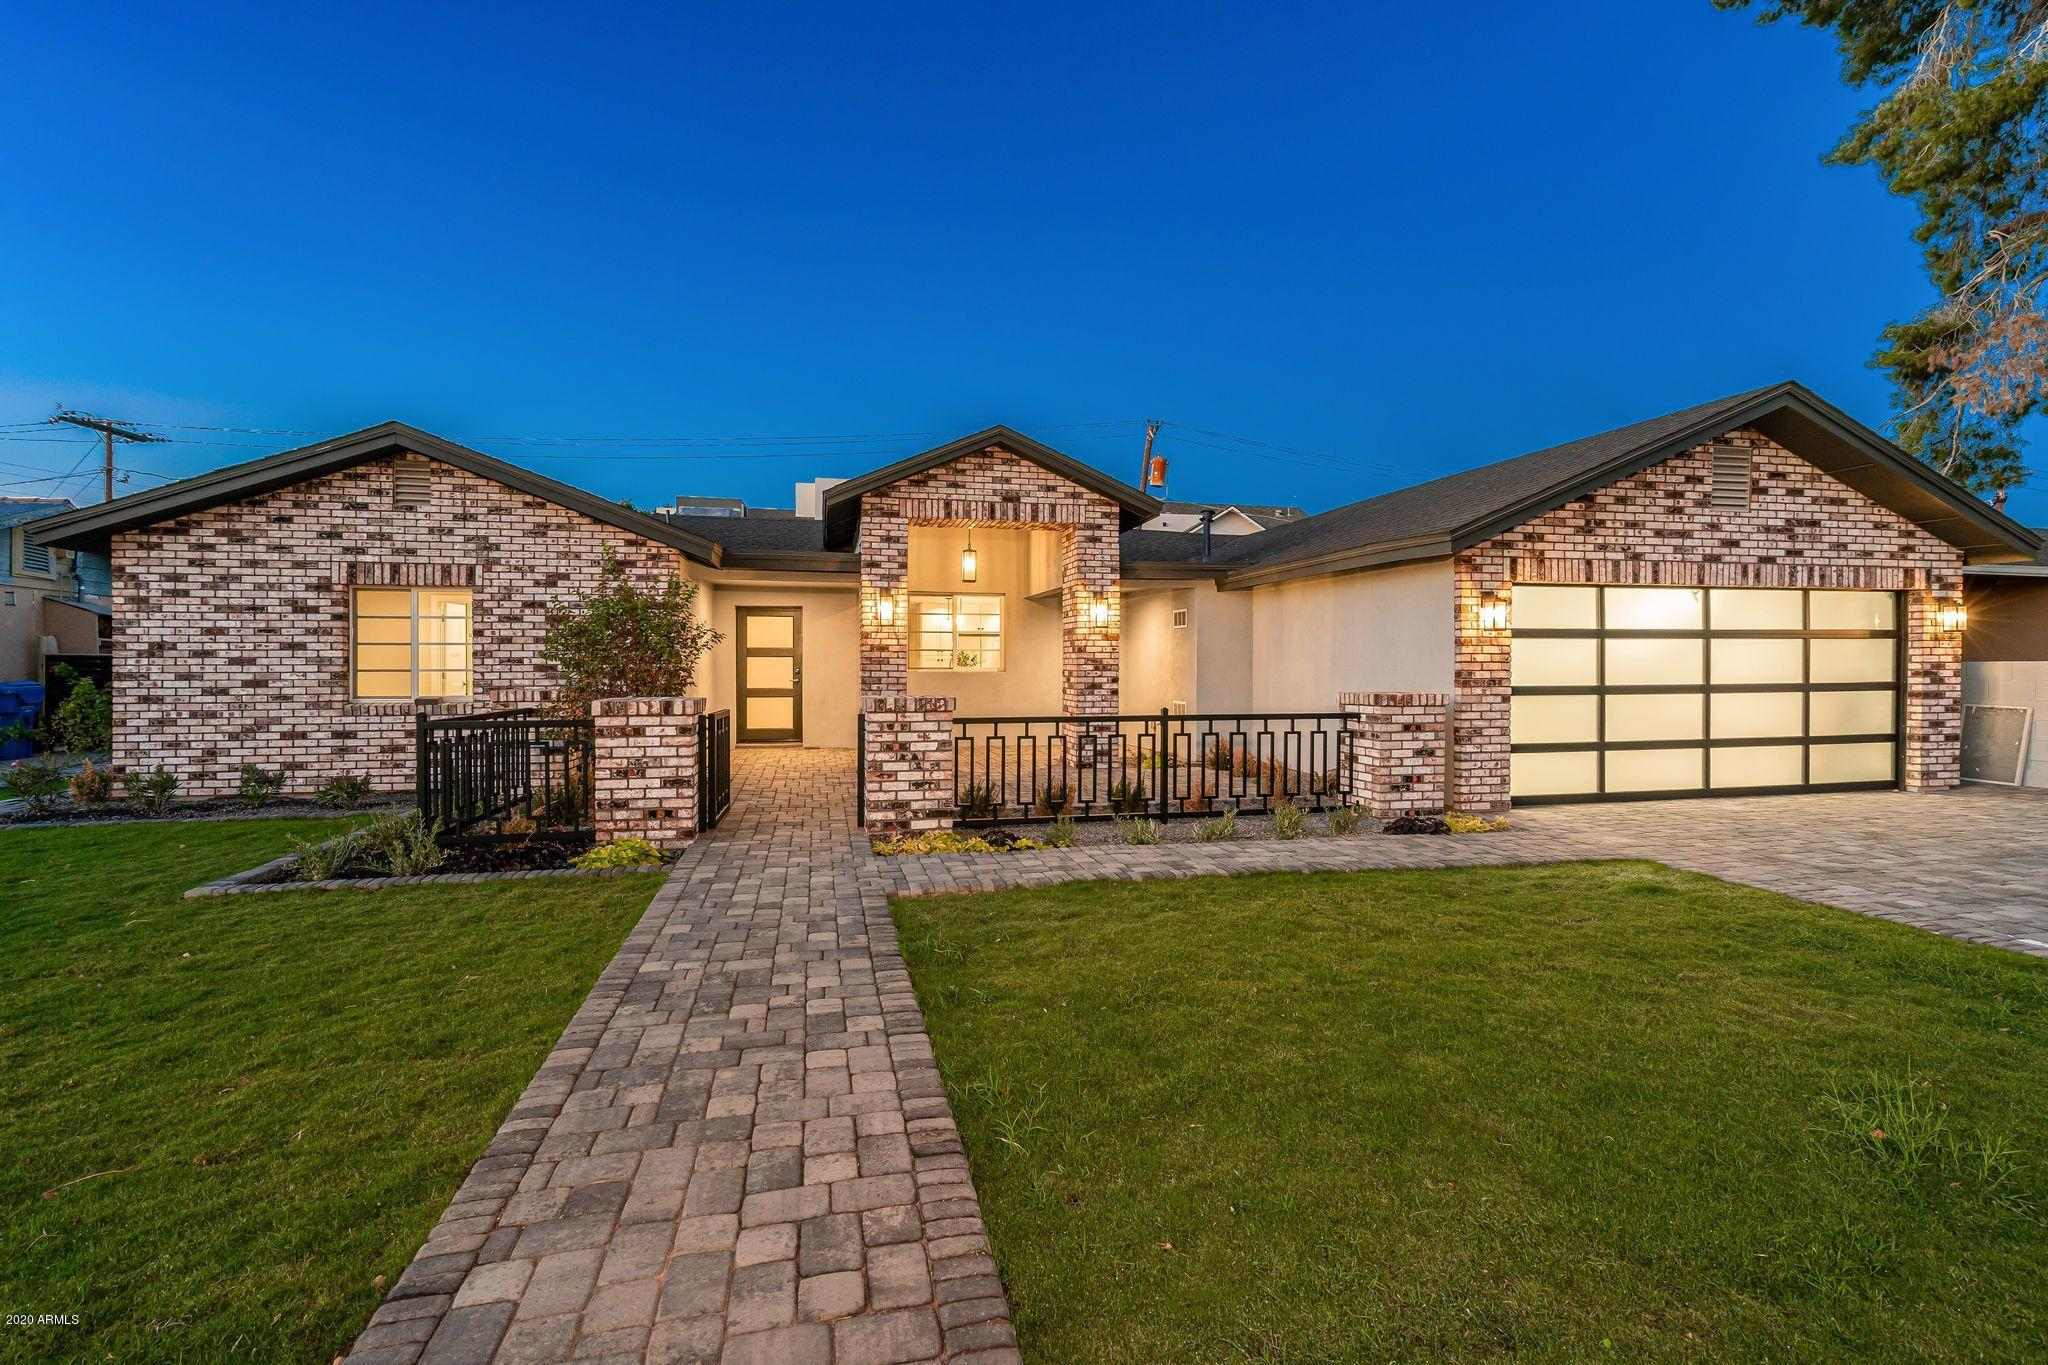 4008 FAIRMOUNT Avenue, Phoenix, Arizona 85018, 3 Bedrooms Bedrooms, ,2.5 BathroomsBathrooms,Residential,For Sale,FAIRMOUNT,6131479